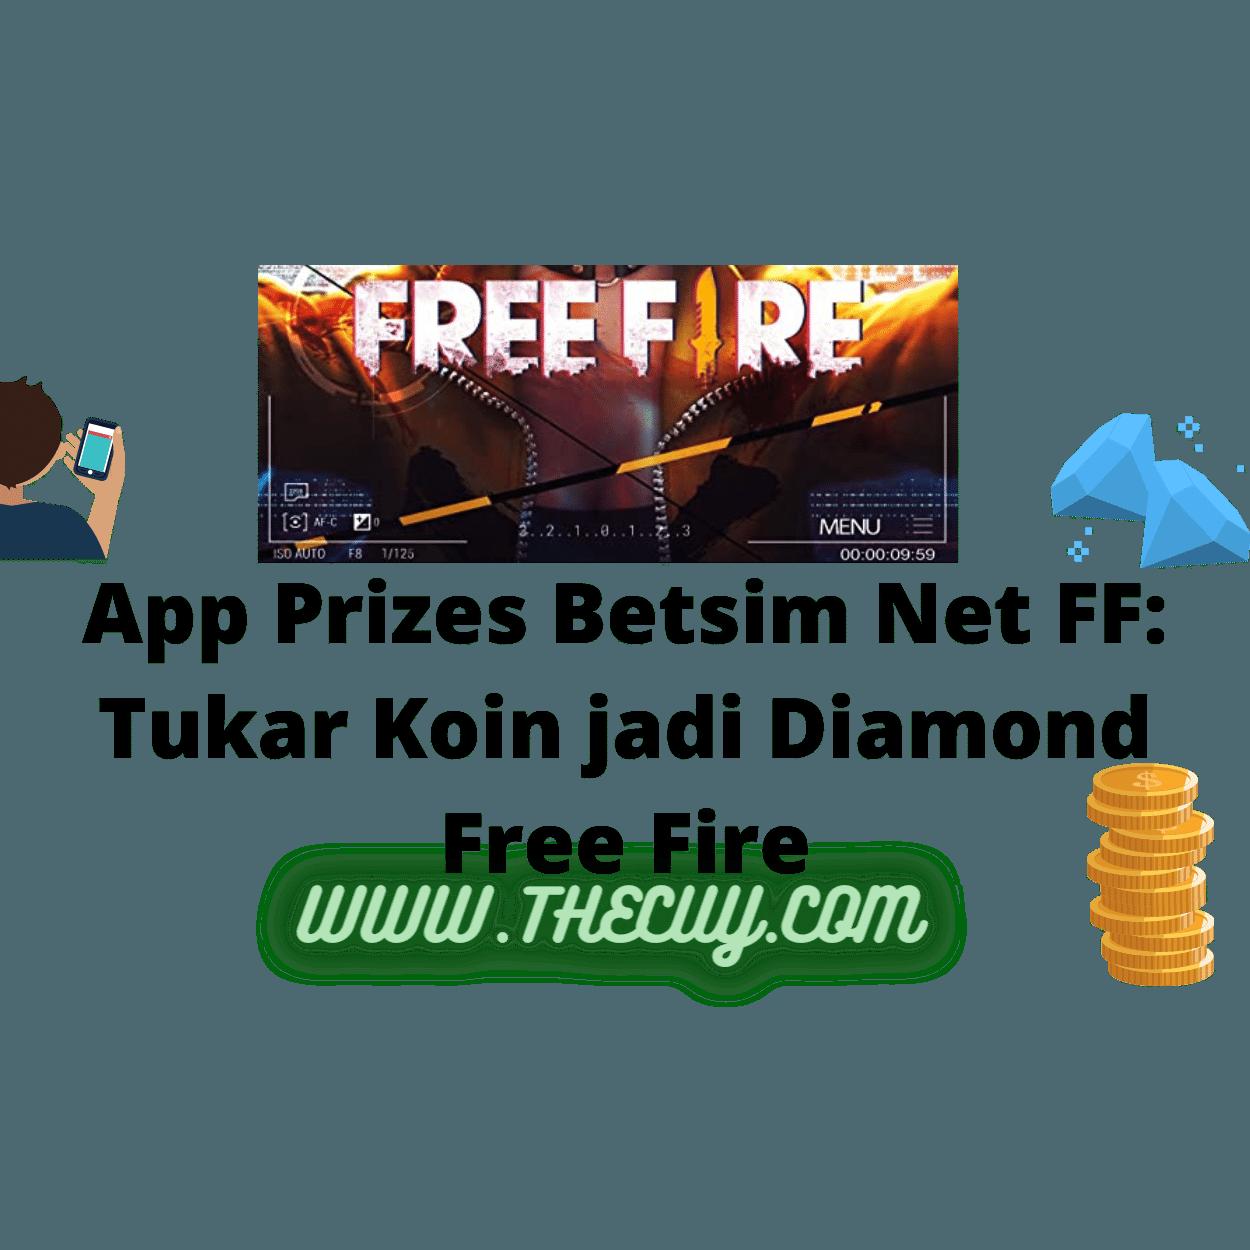 App Prizes Betsim Net FF: Tukar Koin jadi Diamond Free Fire